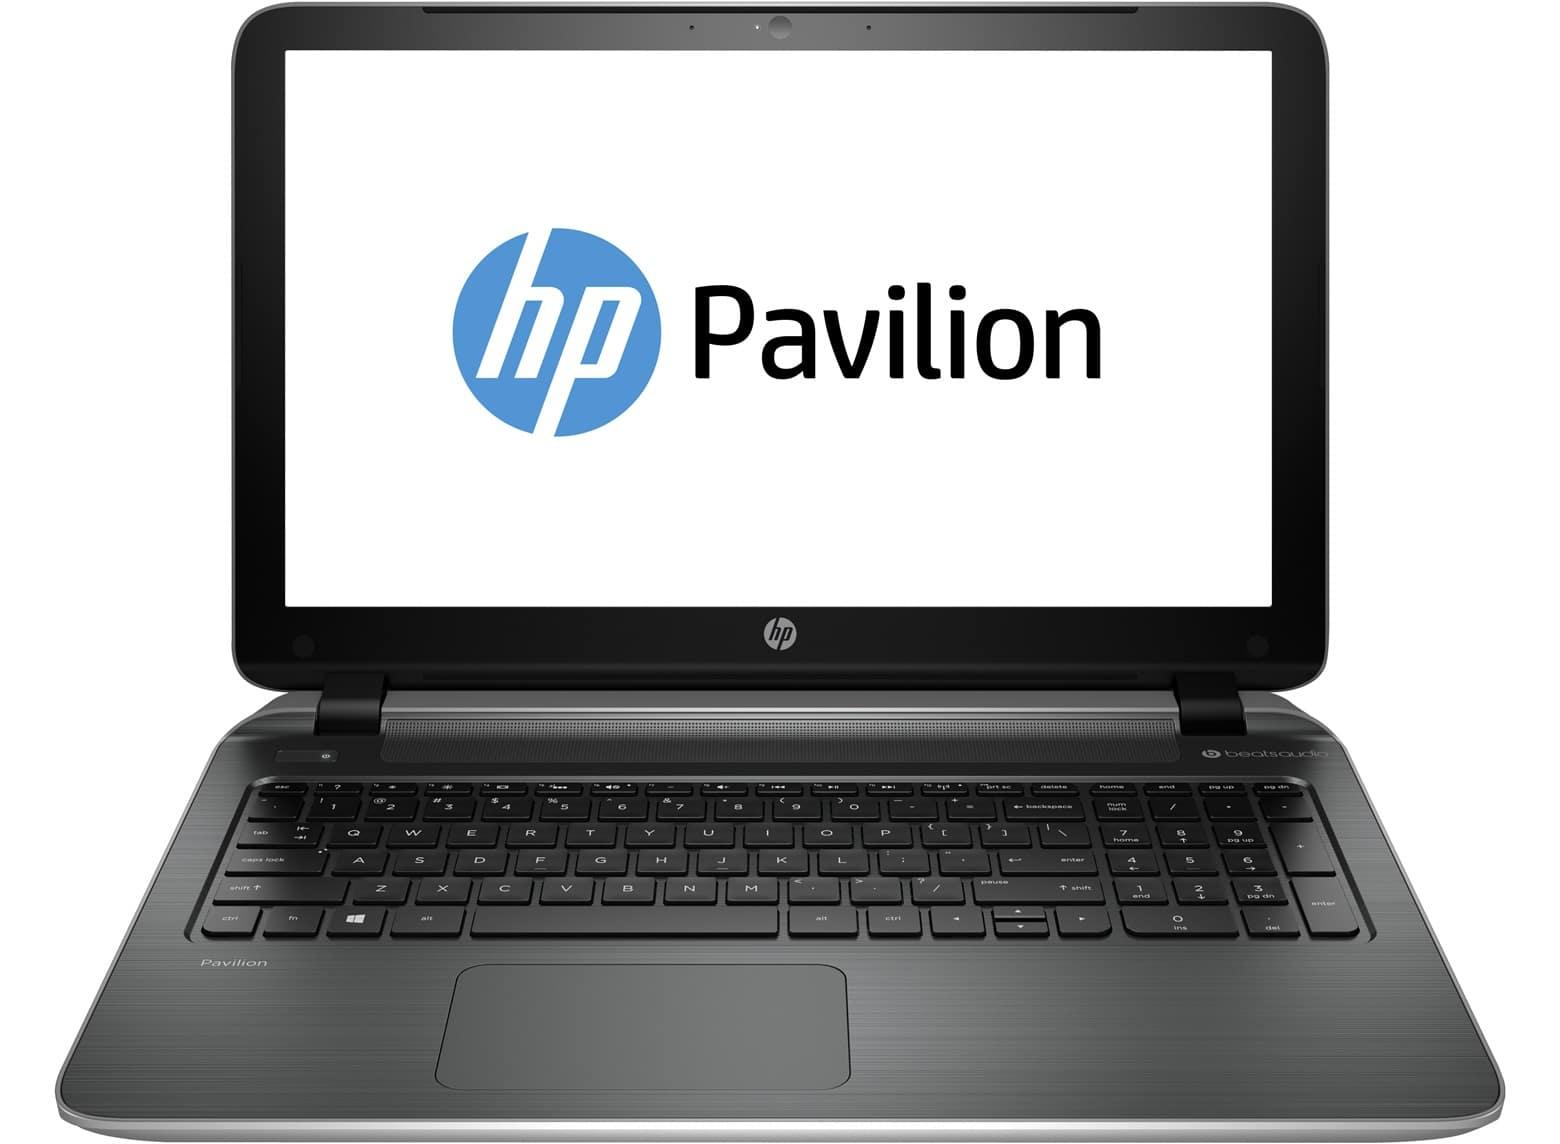 HP Pavilion 15-p005nf 3